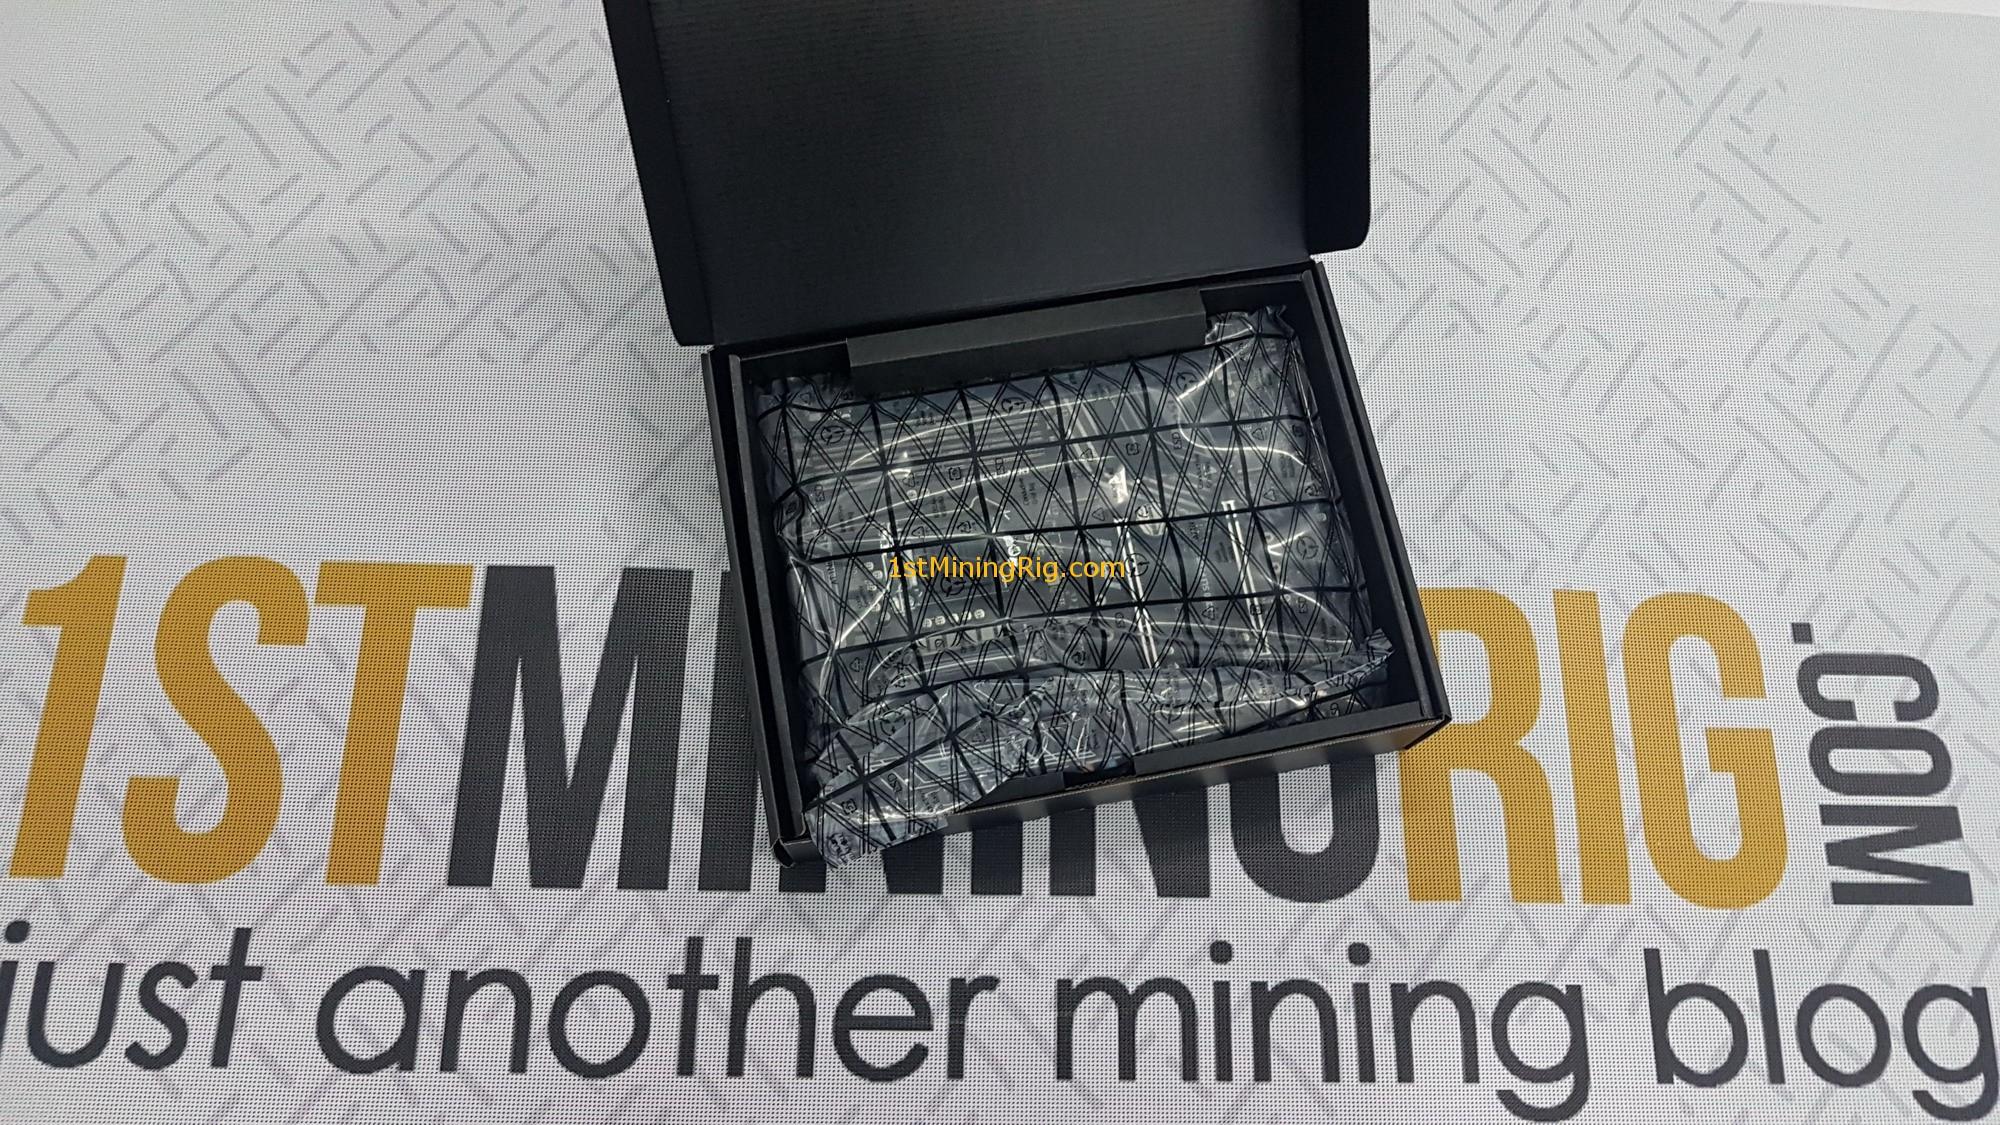 MSI Z370 SLI PLUS Mining Review & How To Setup - 1st Mining Rig